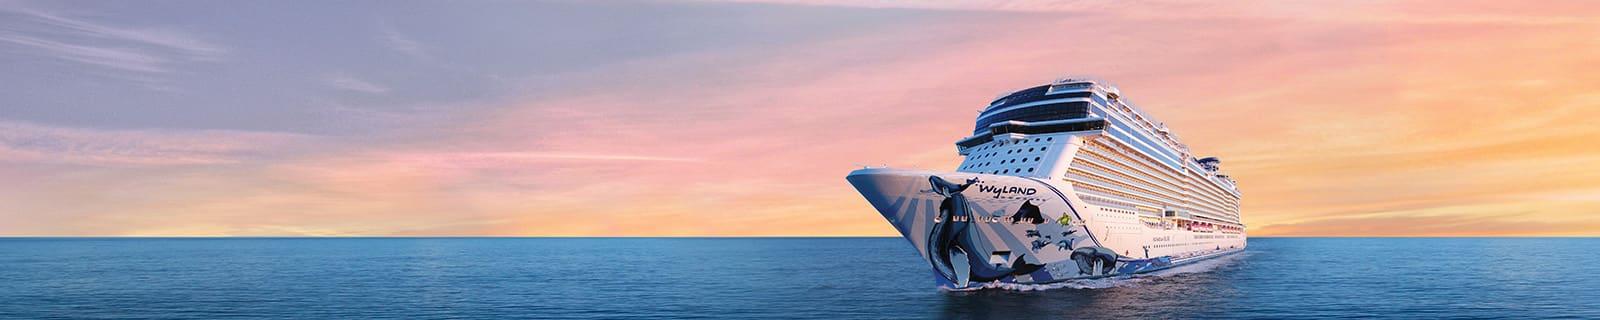 Pagina MI.Cruise_Freedom1600x320